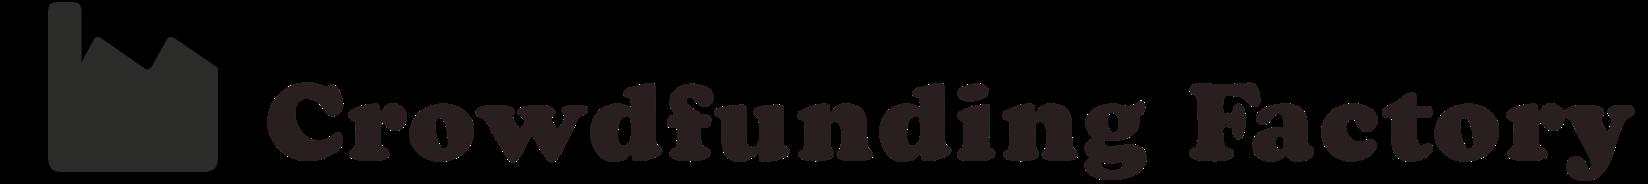 logo_crowdfunding_factory